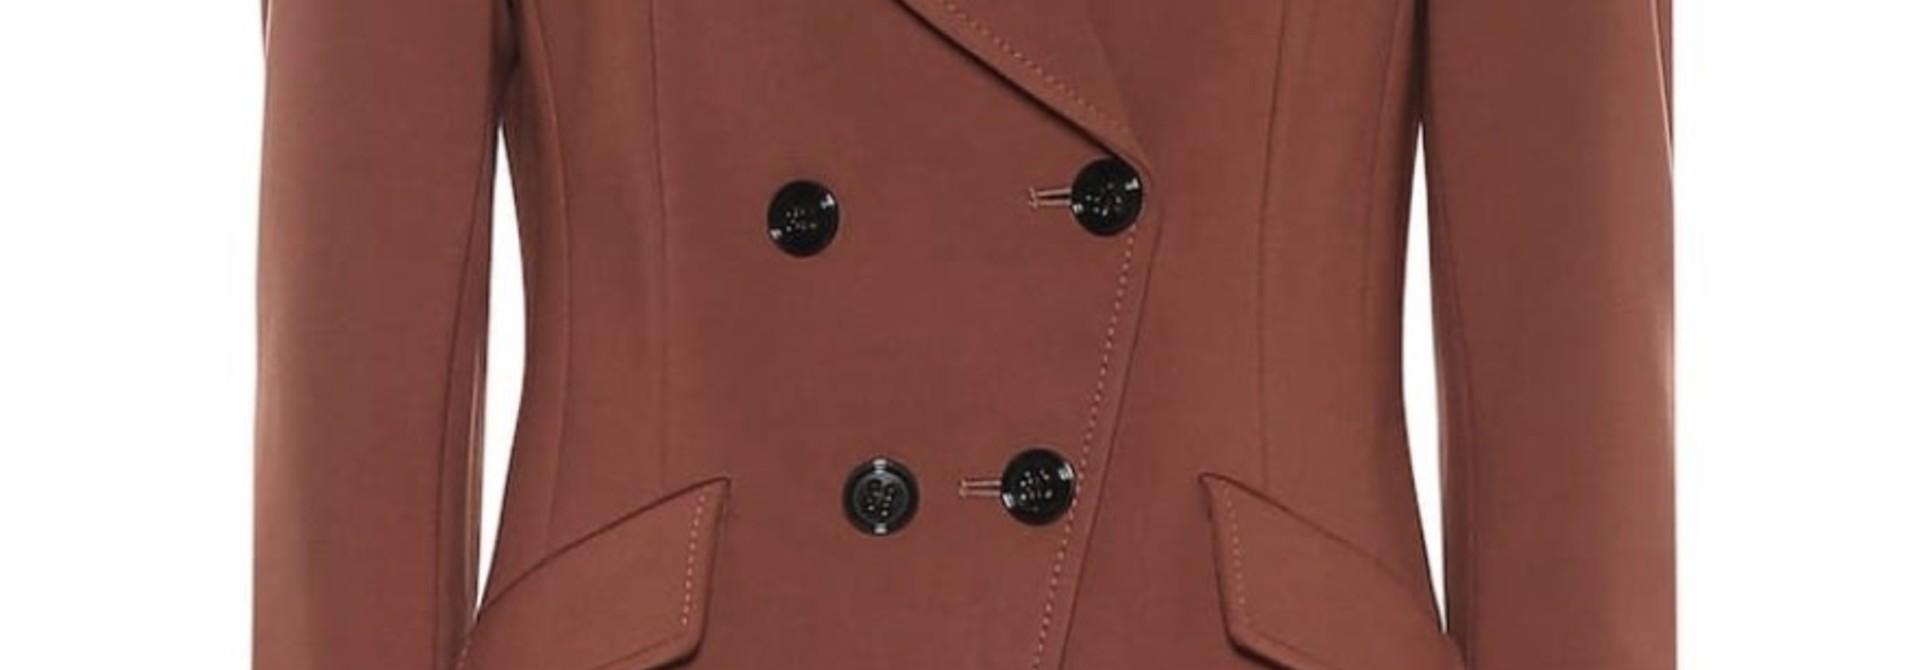 Emotional essence jacket Dorothee Schumacher